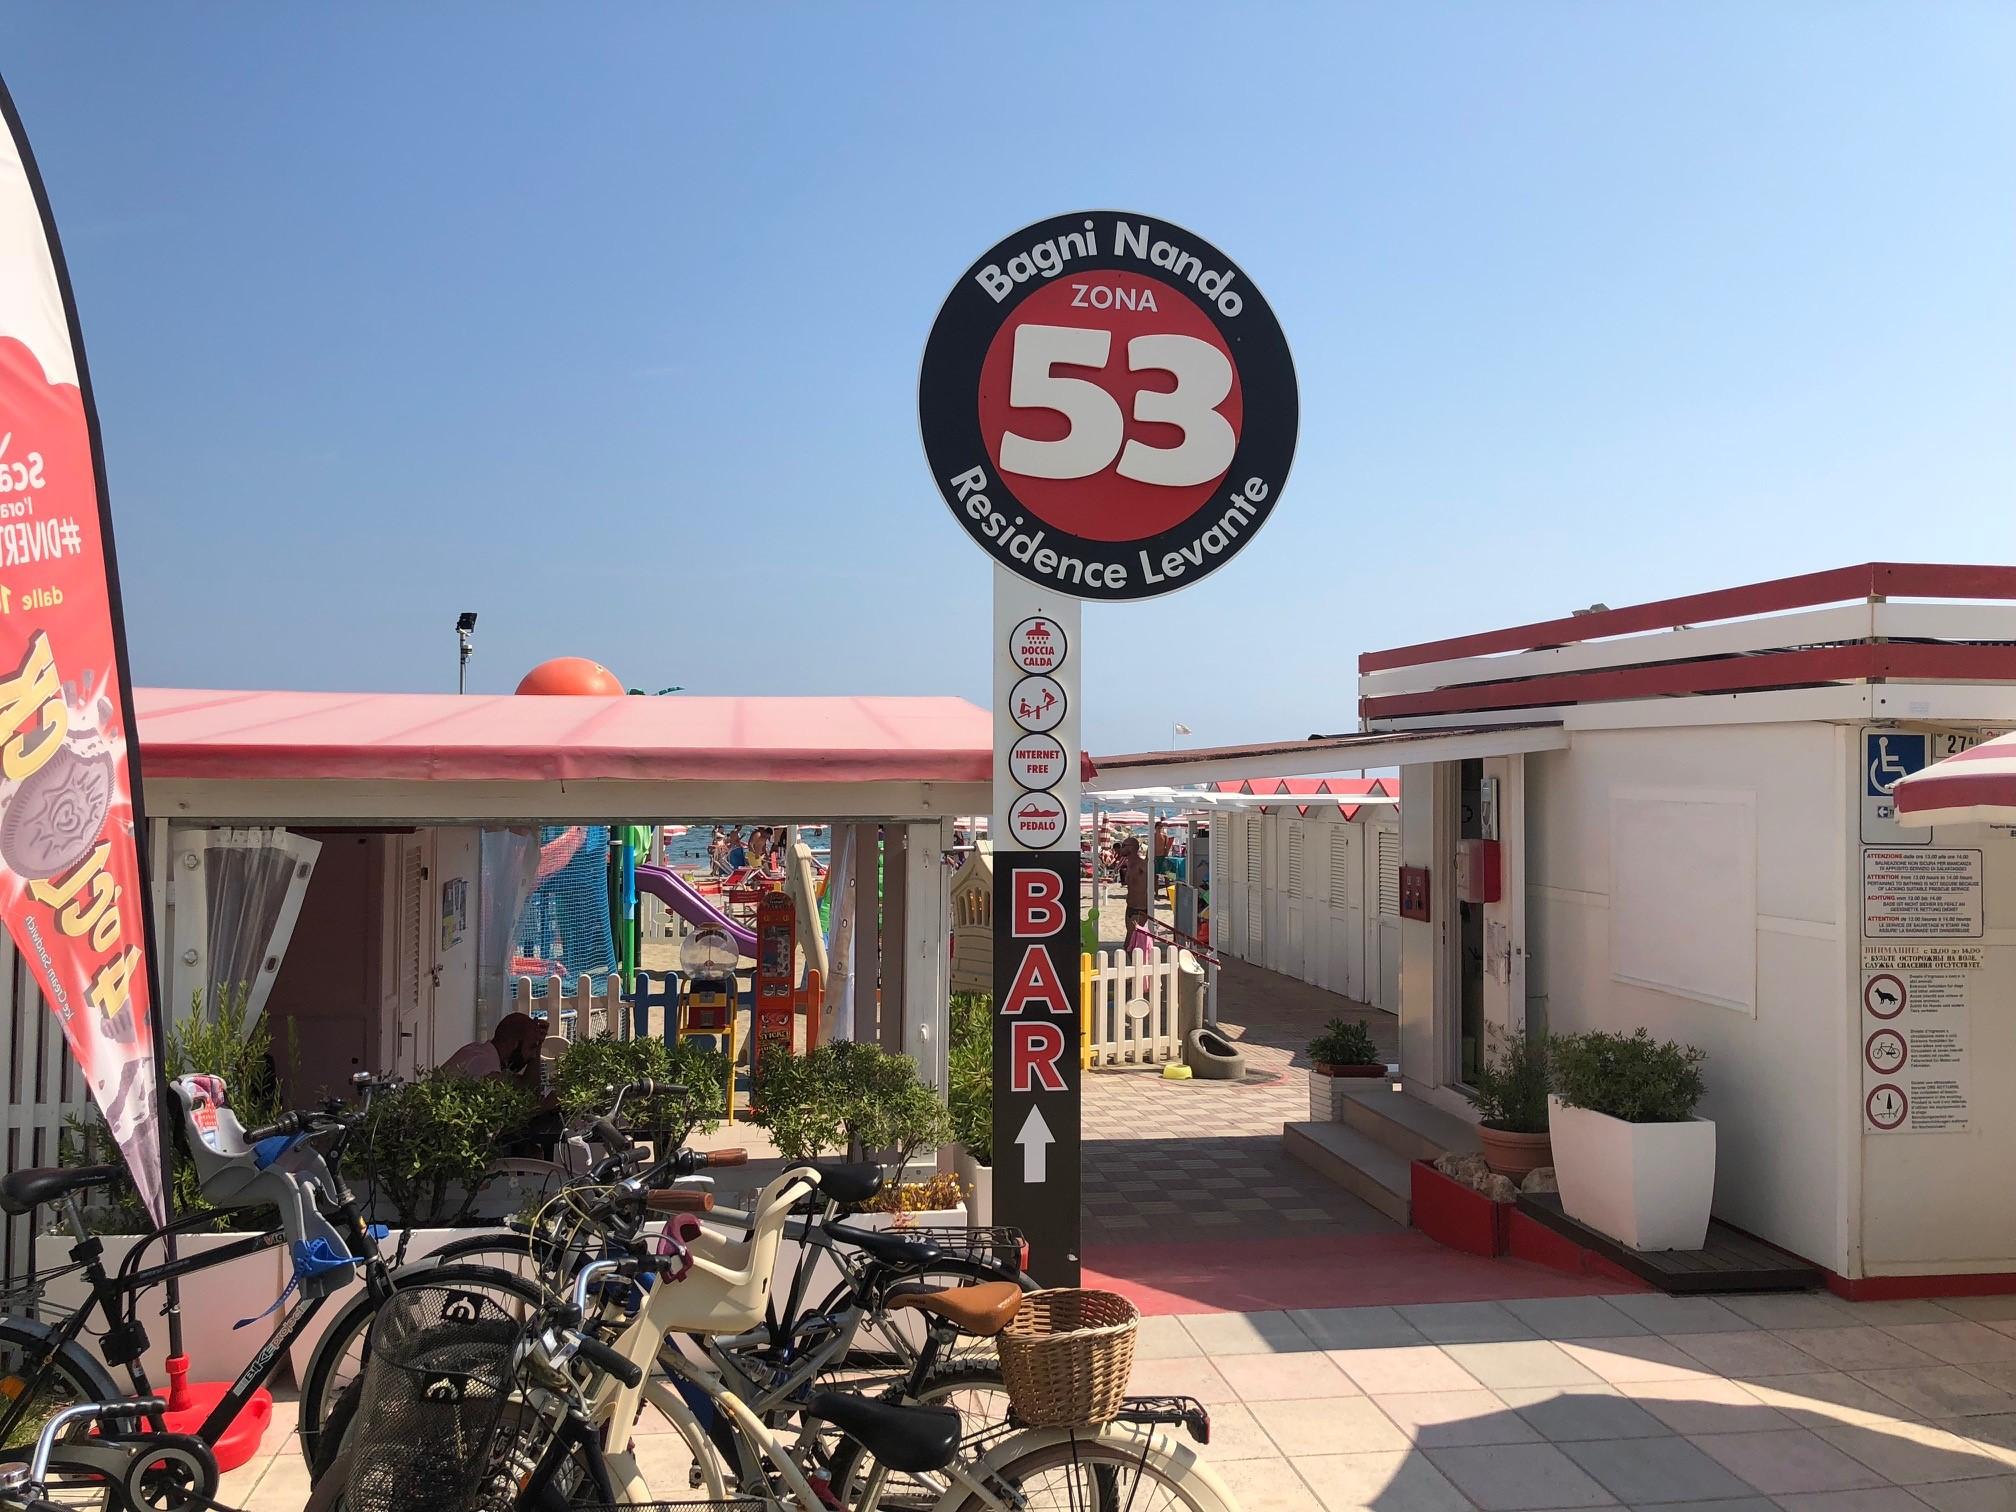 Bagno 53 Nando